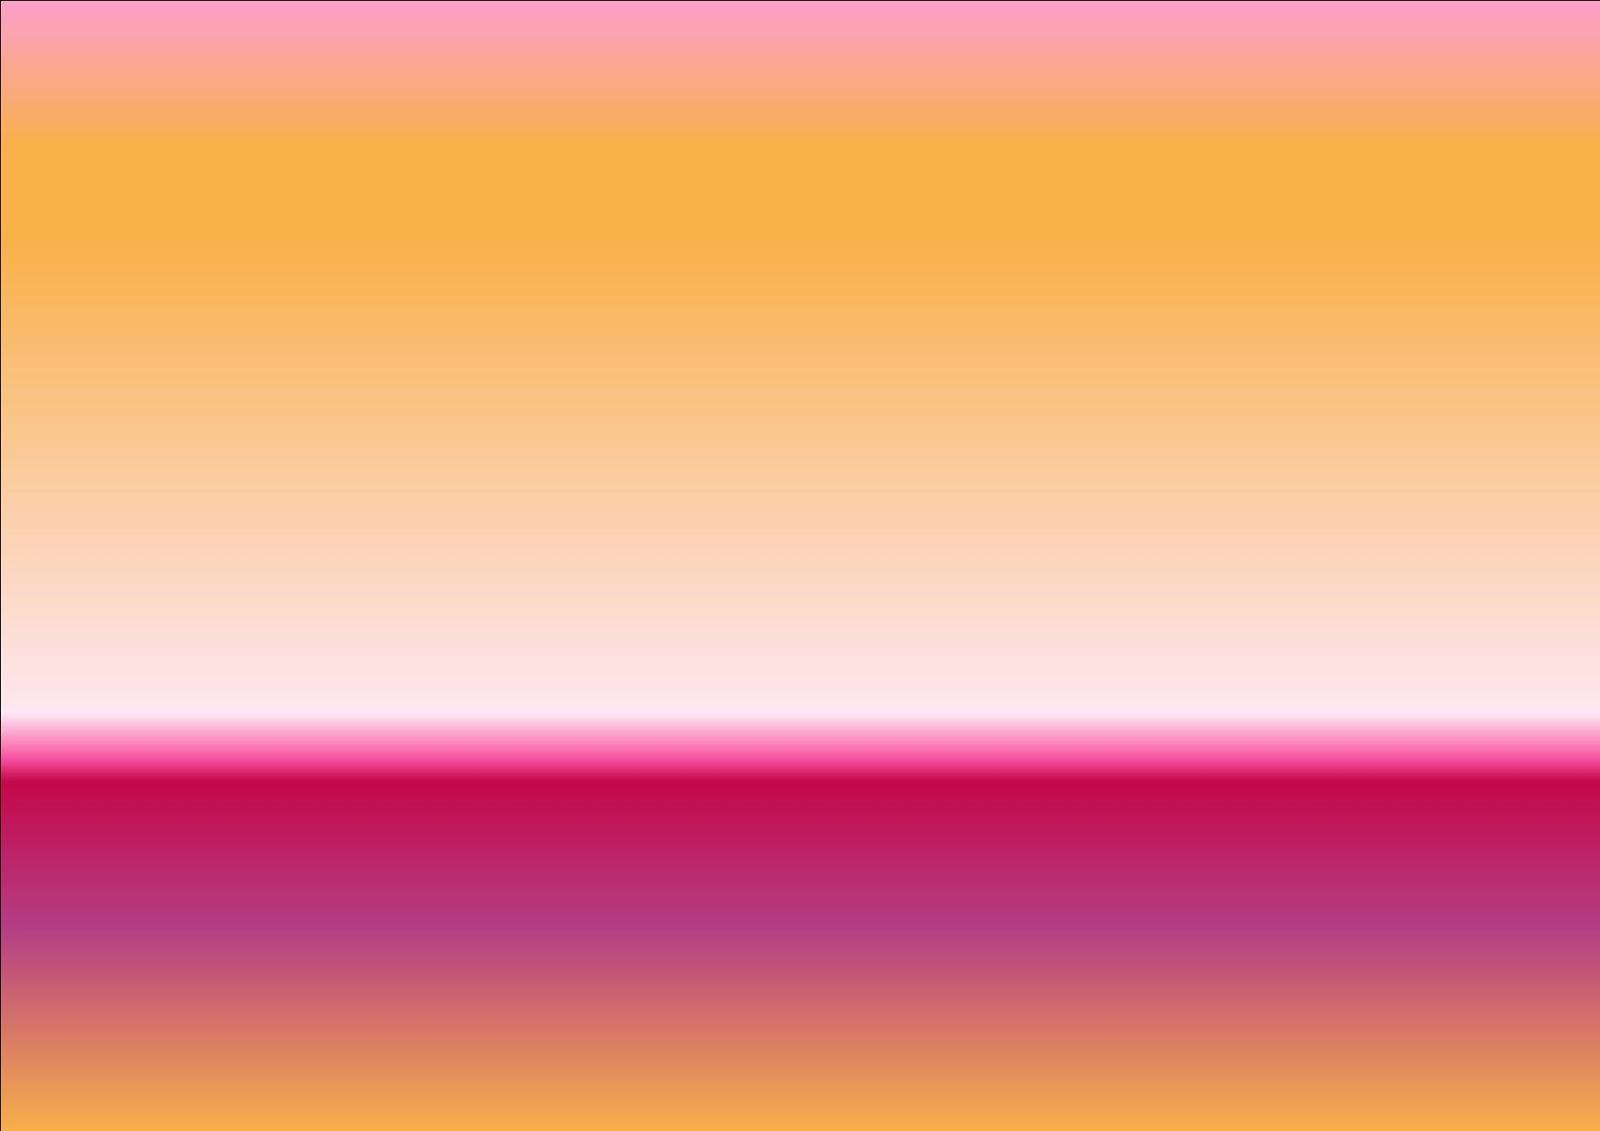 Fondos degradee de colores pasteles for De colores de colores